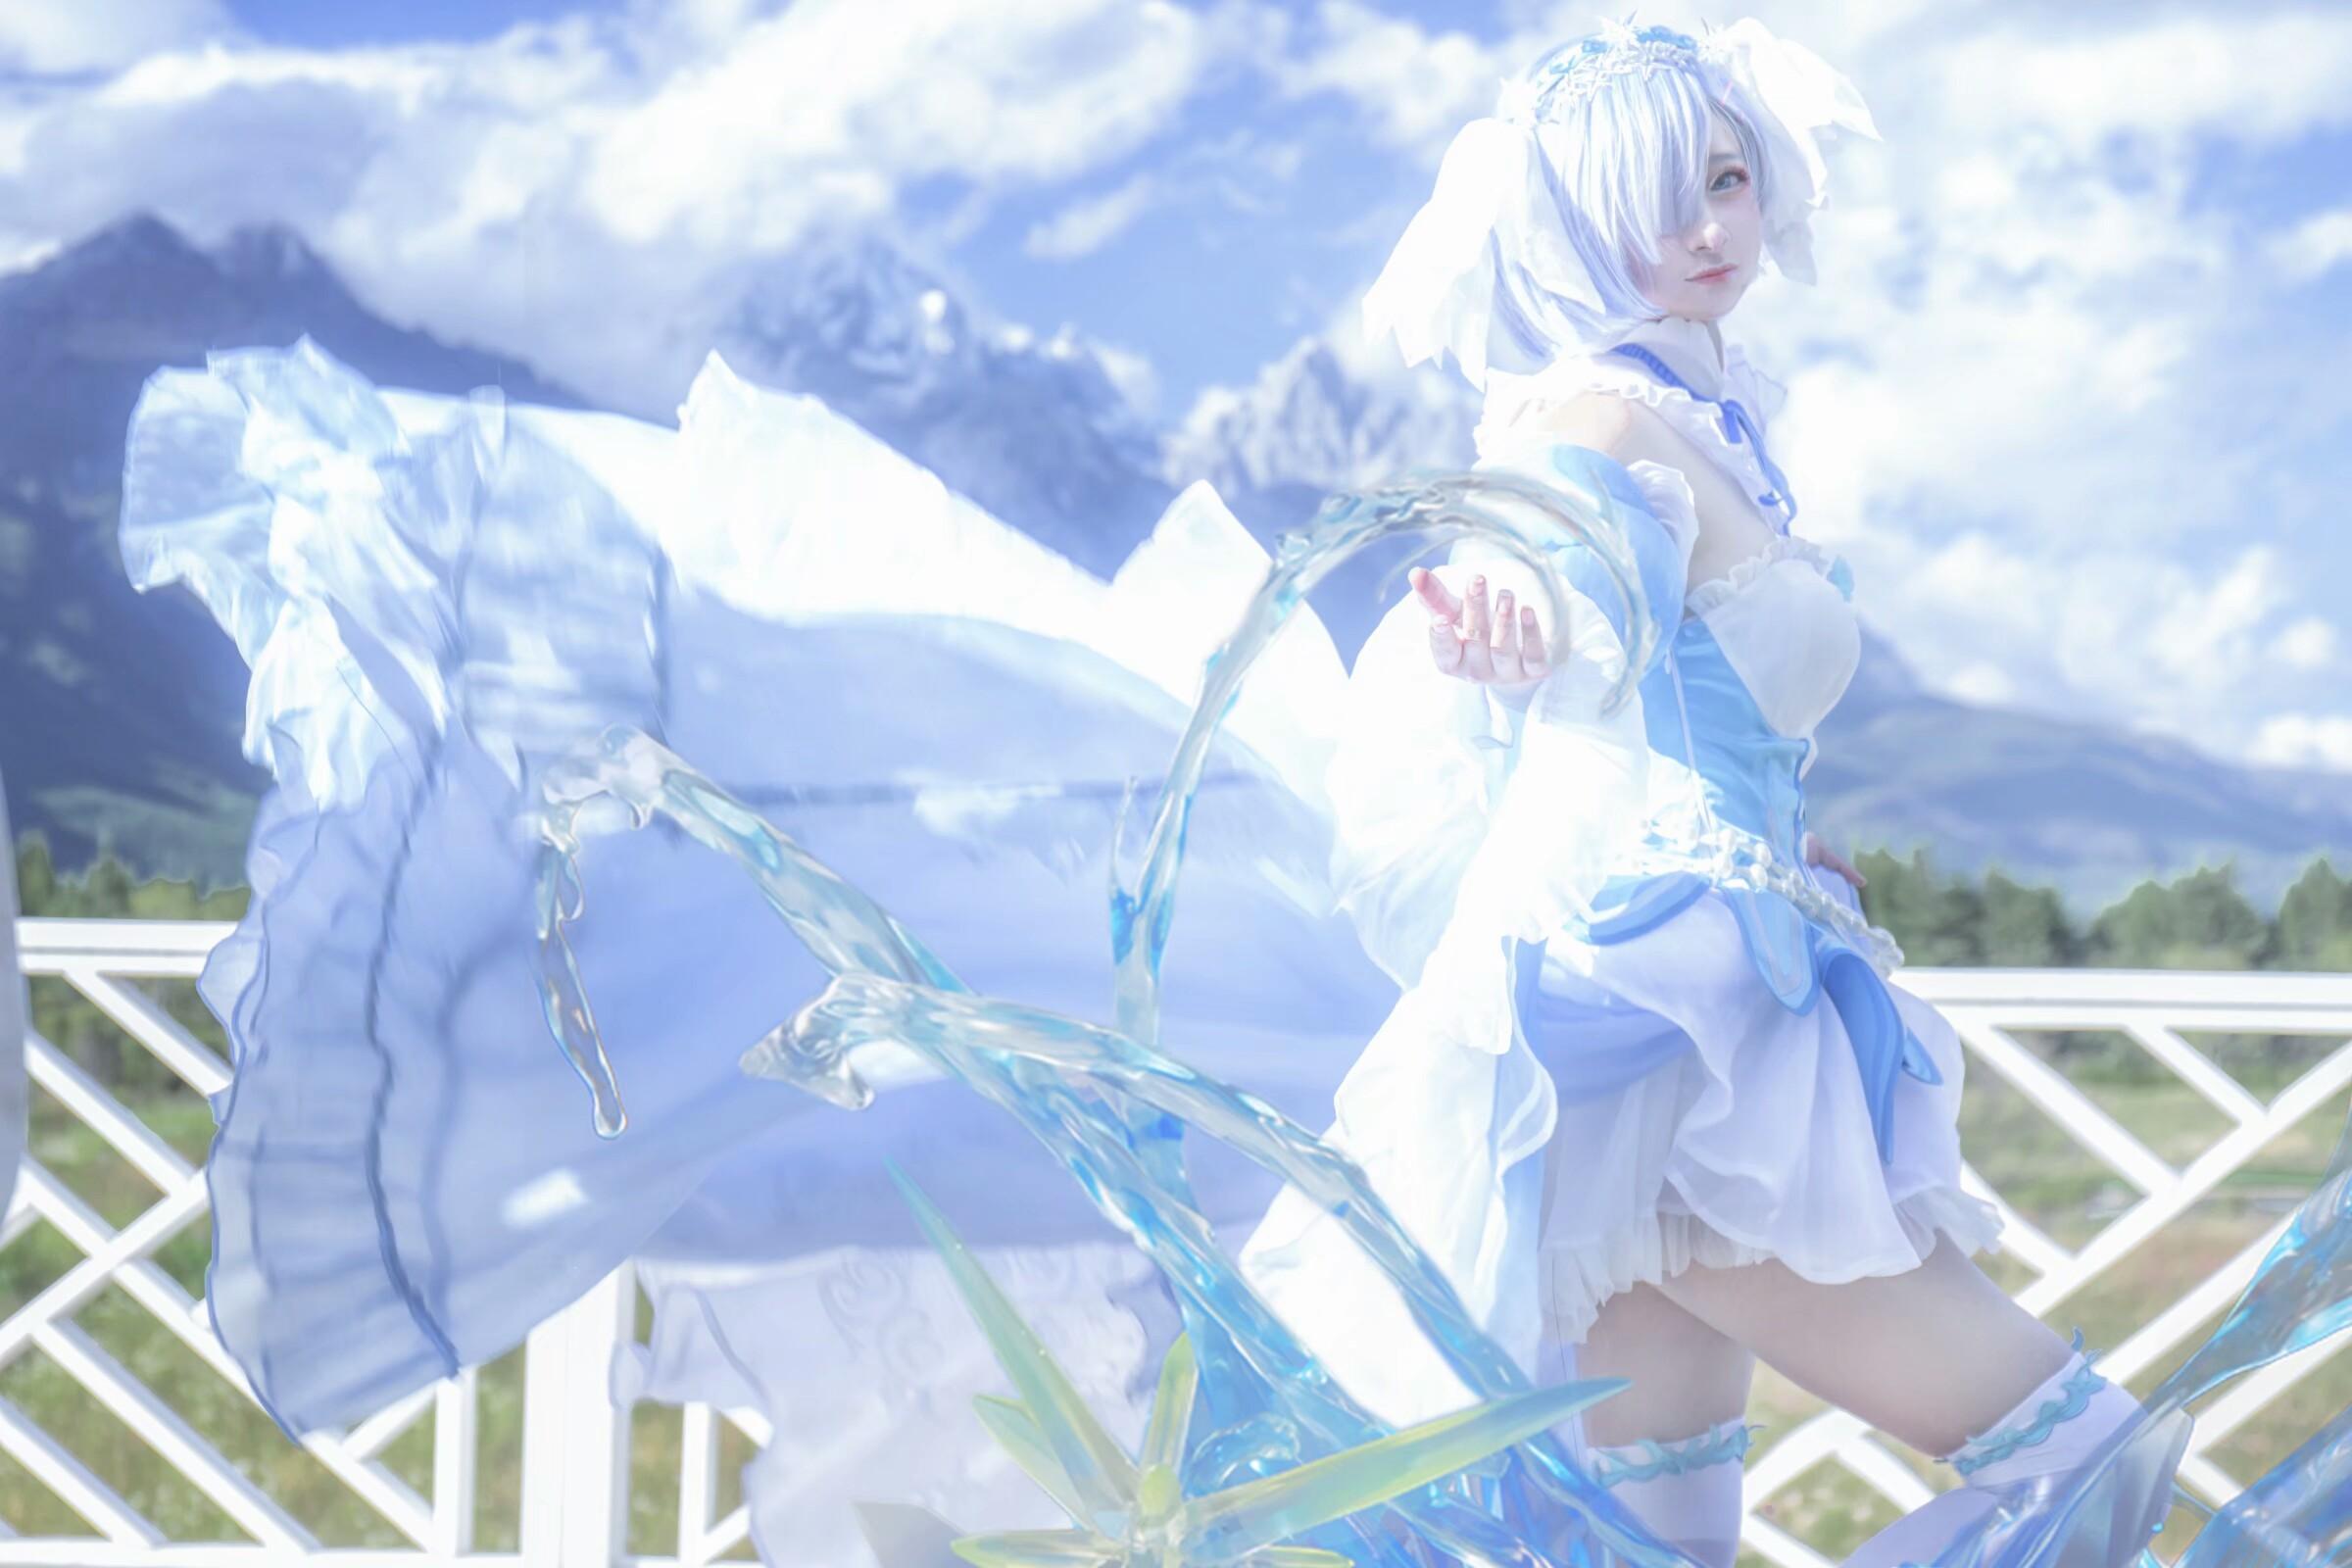 《RE:从零开始的异世界生活》十一cosplay【CN:咸鱼爱扯淡】-第1张